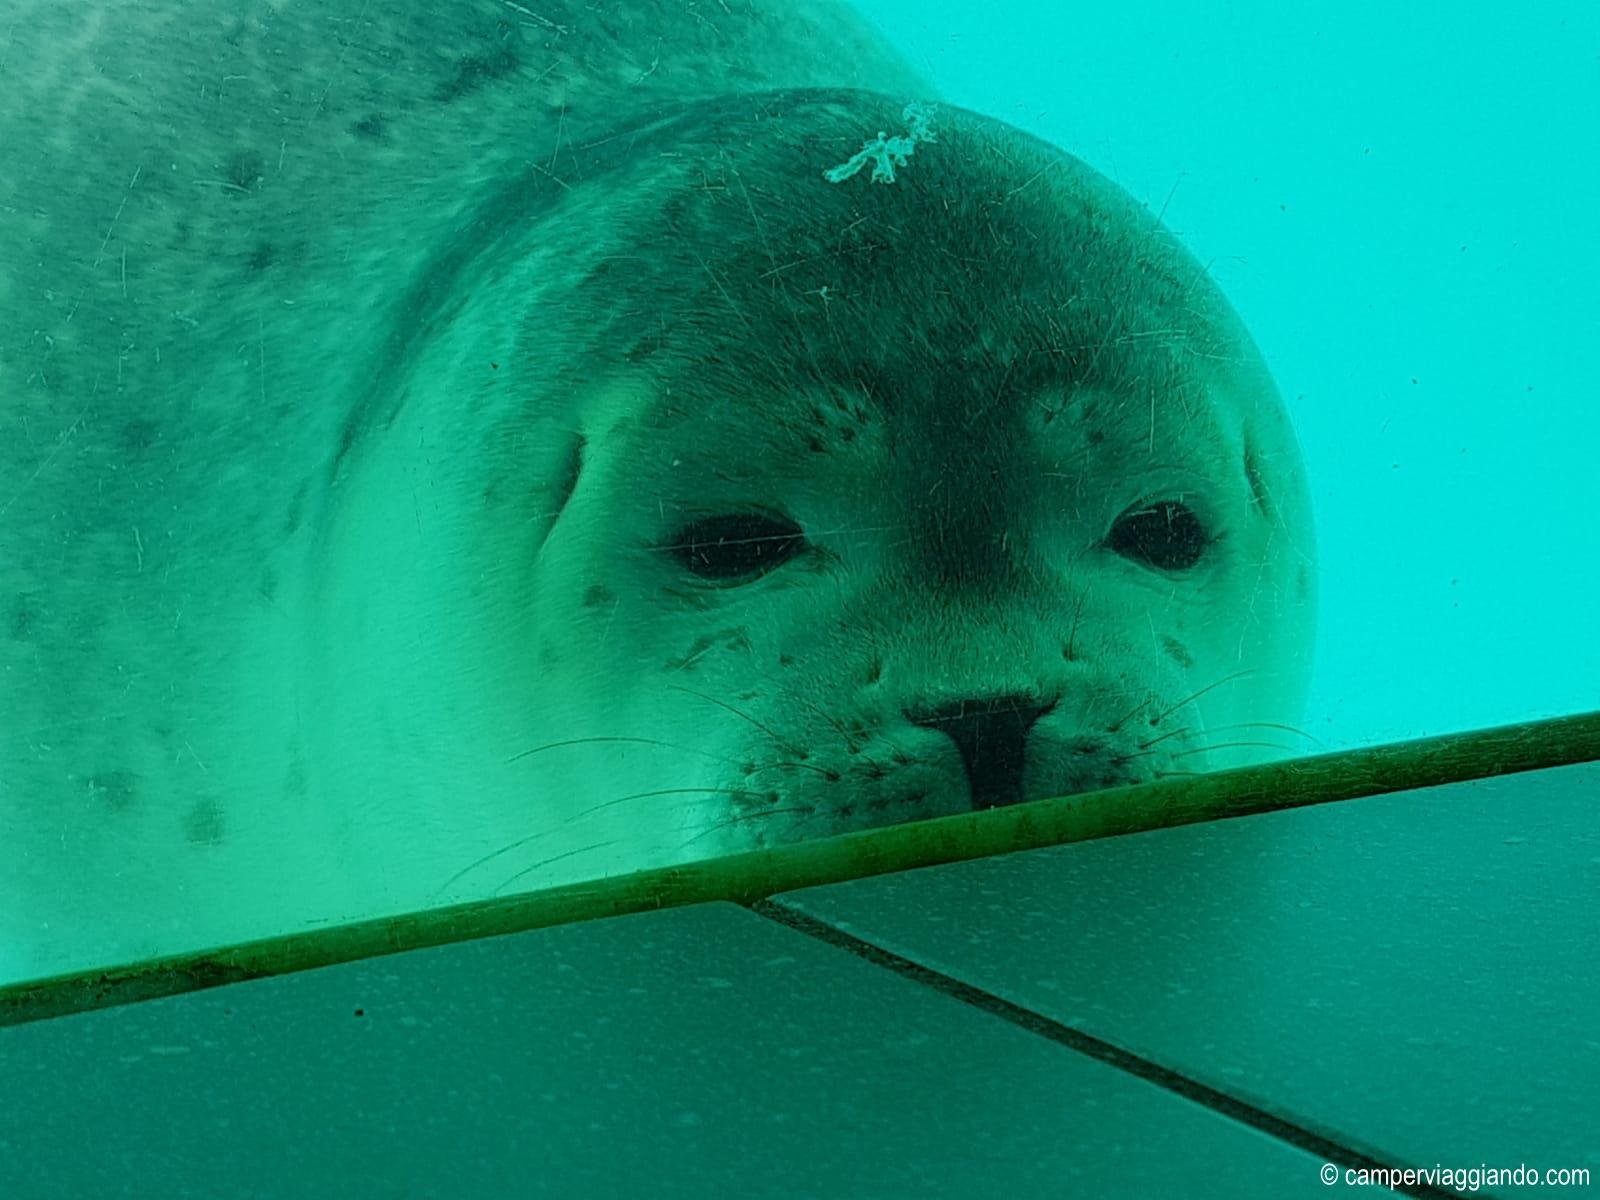 Pieterburen vetro con la foca